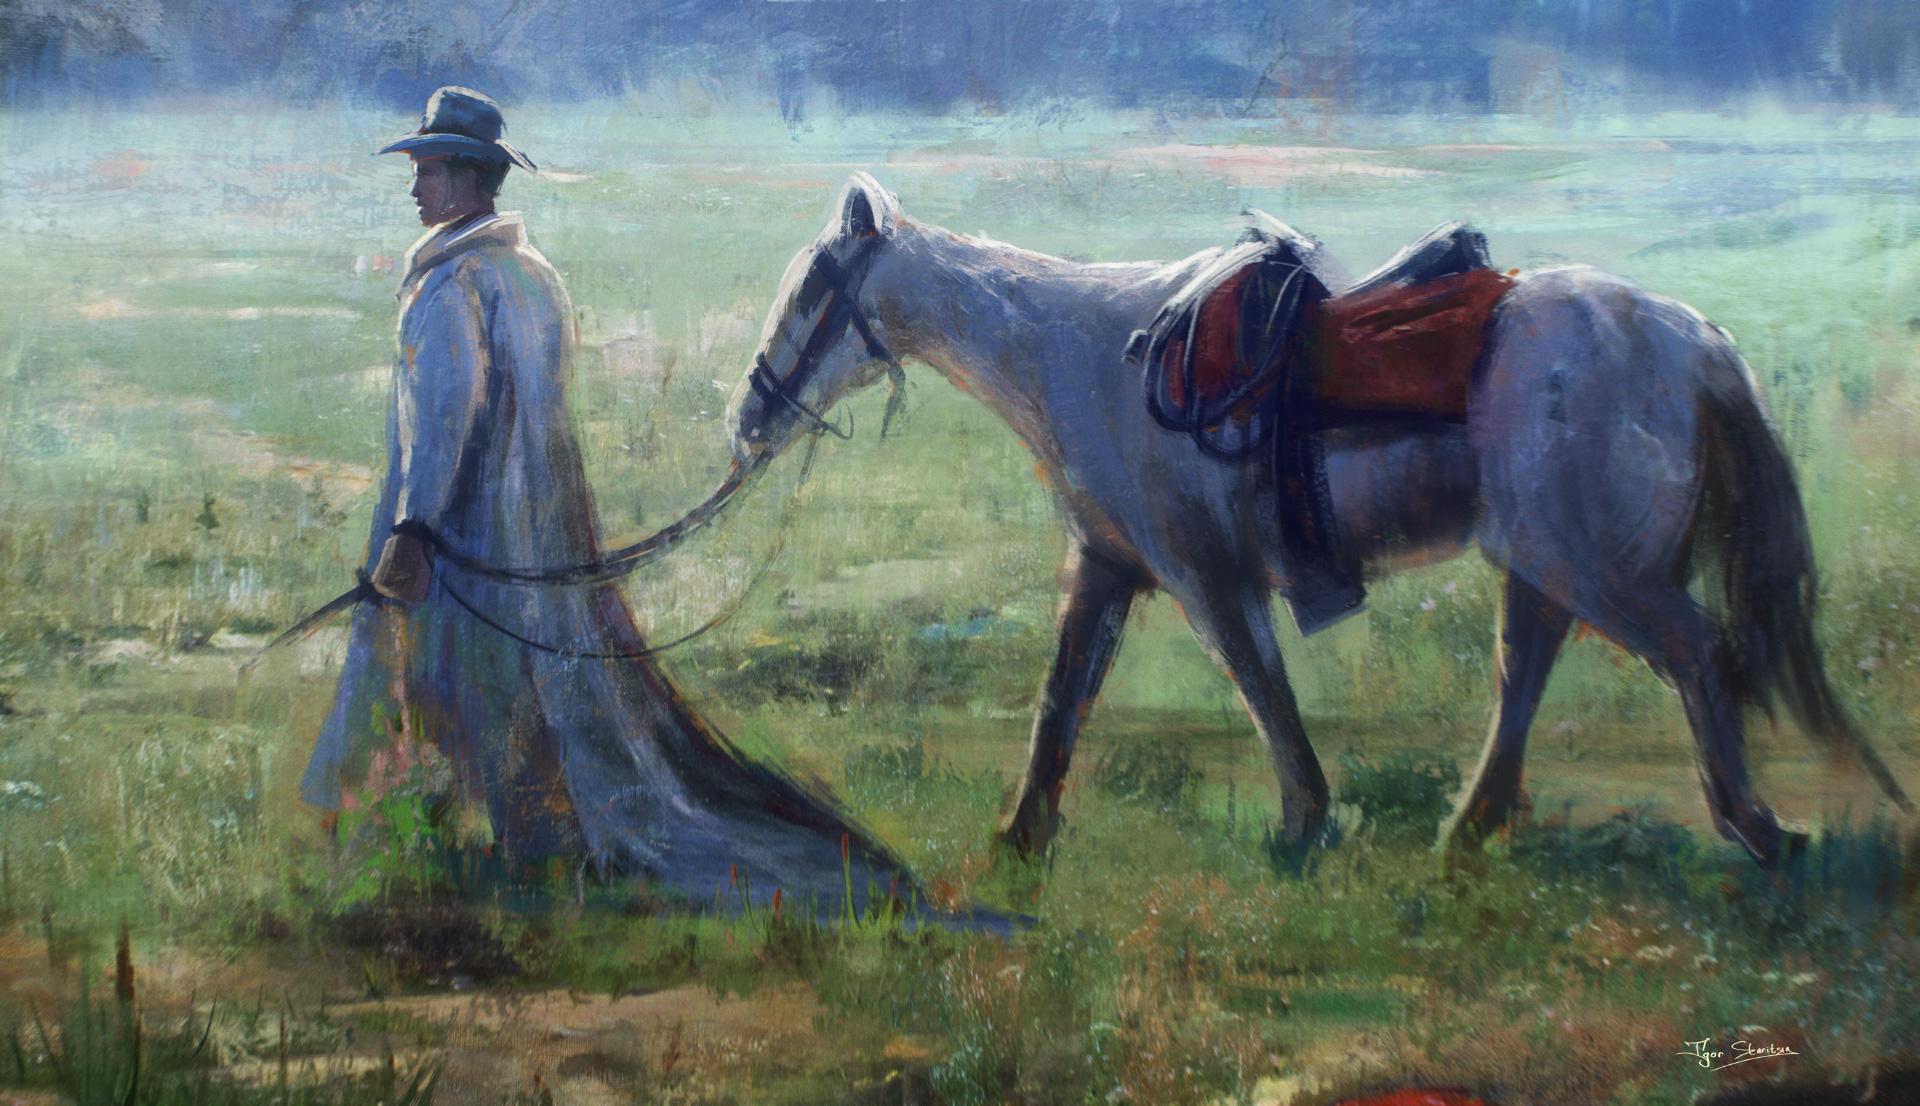 16.CowboysSketch_v002.jpg